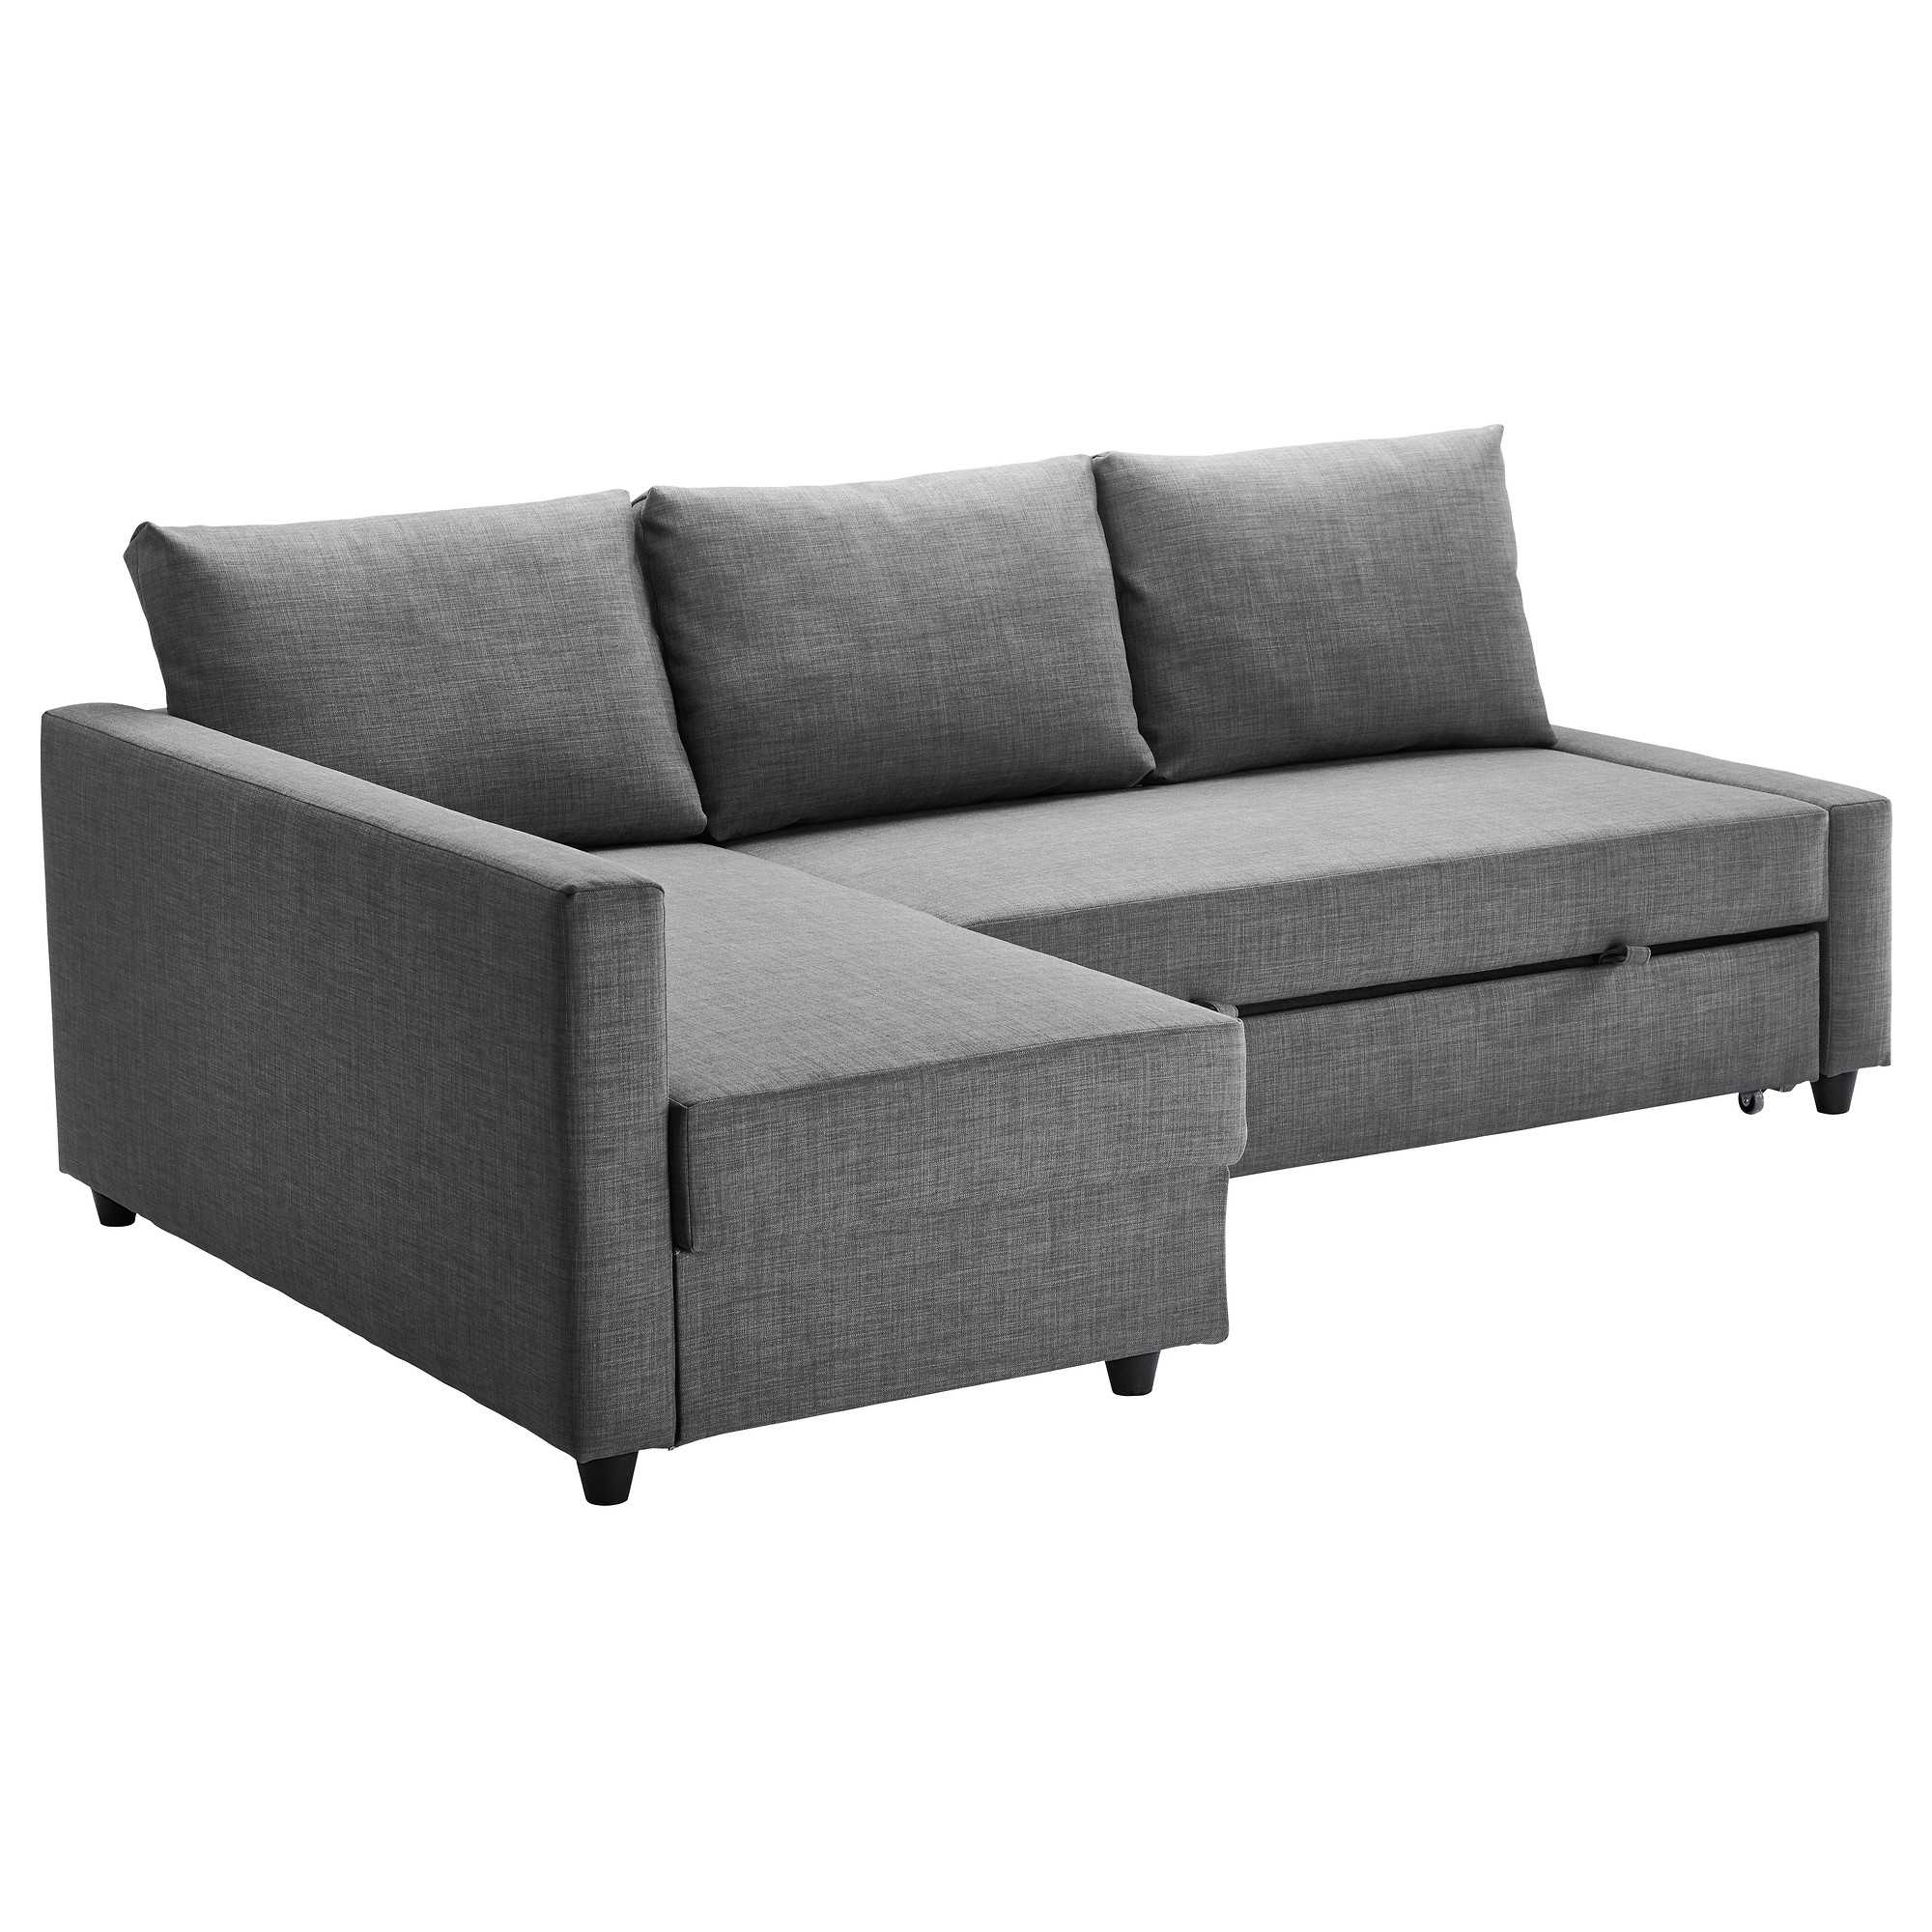 Friheten Corner Sofa Bed With Storage – Skiftebo Dark Gray – Ikea Within Popular Ikea Corner Sofas With Storage (View 5 of 20)